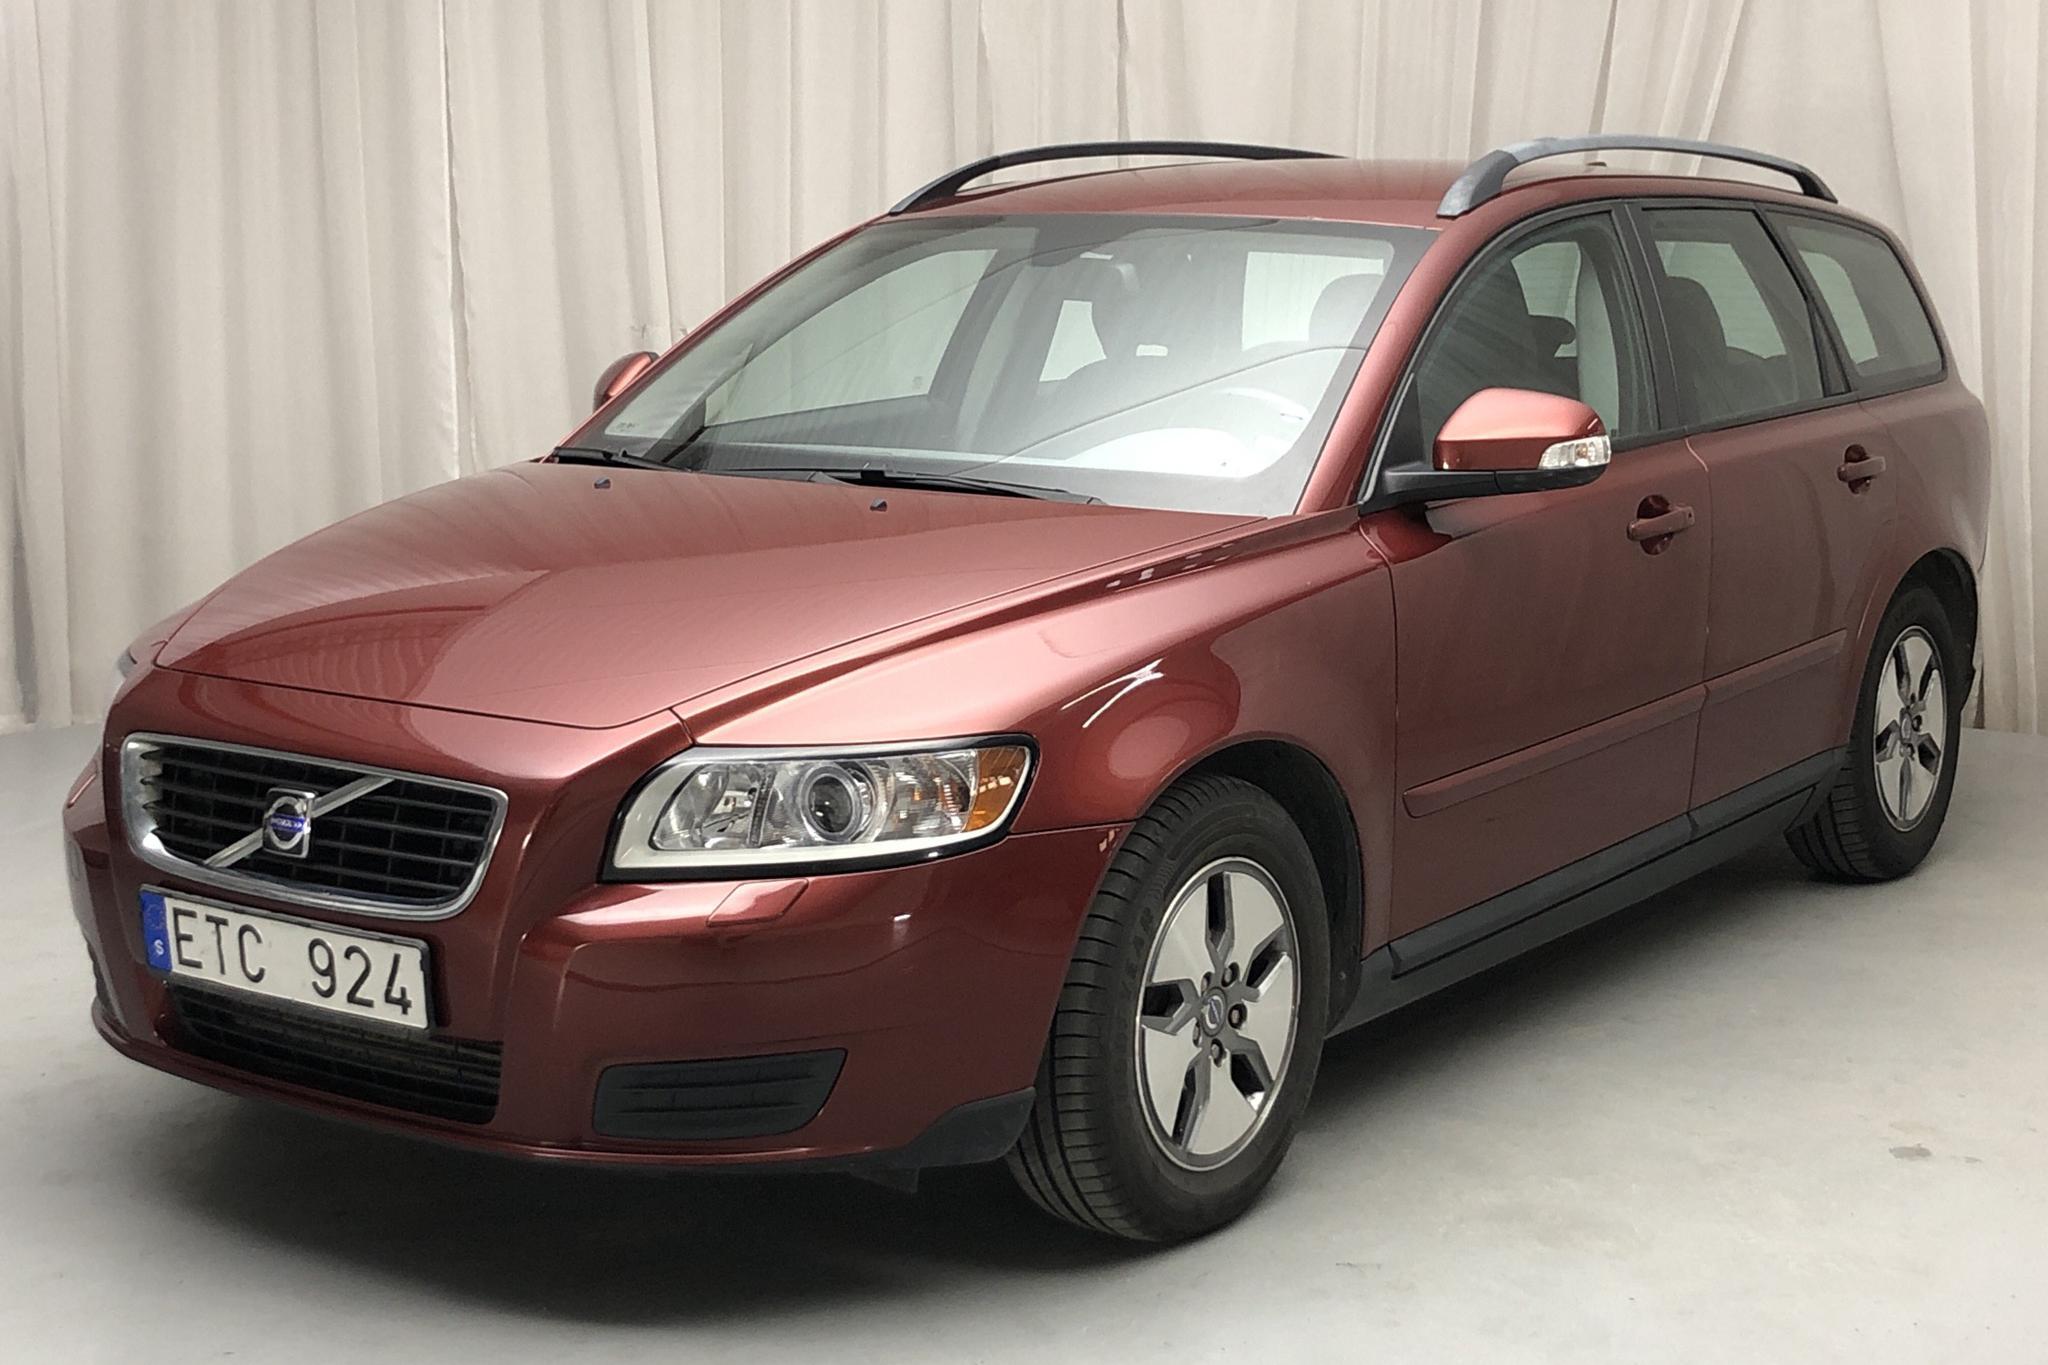 Volvo V50 1.6D DRIVe (109hk) - 14 952 mil - Manuell - röd - 2010